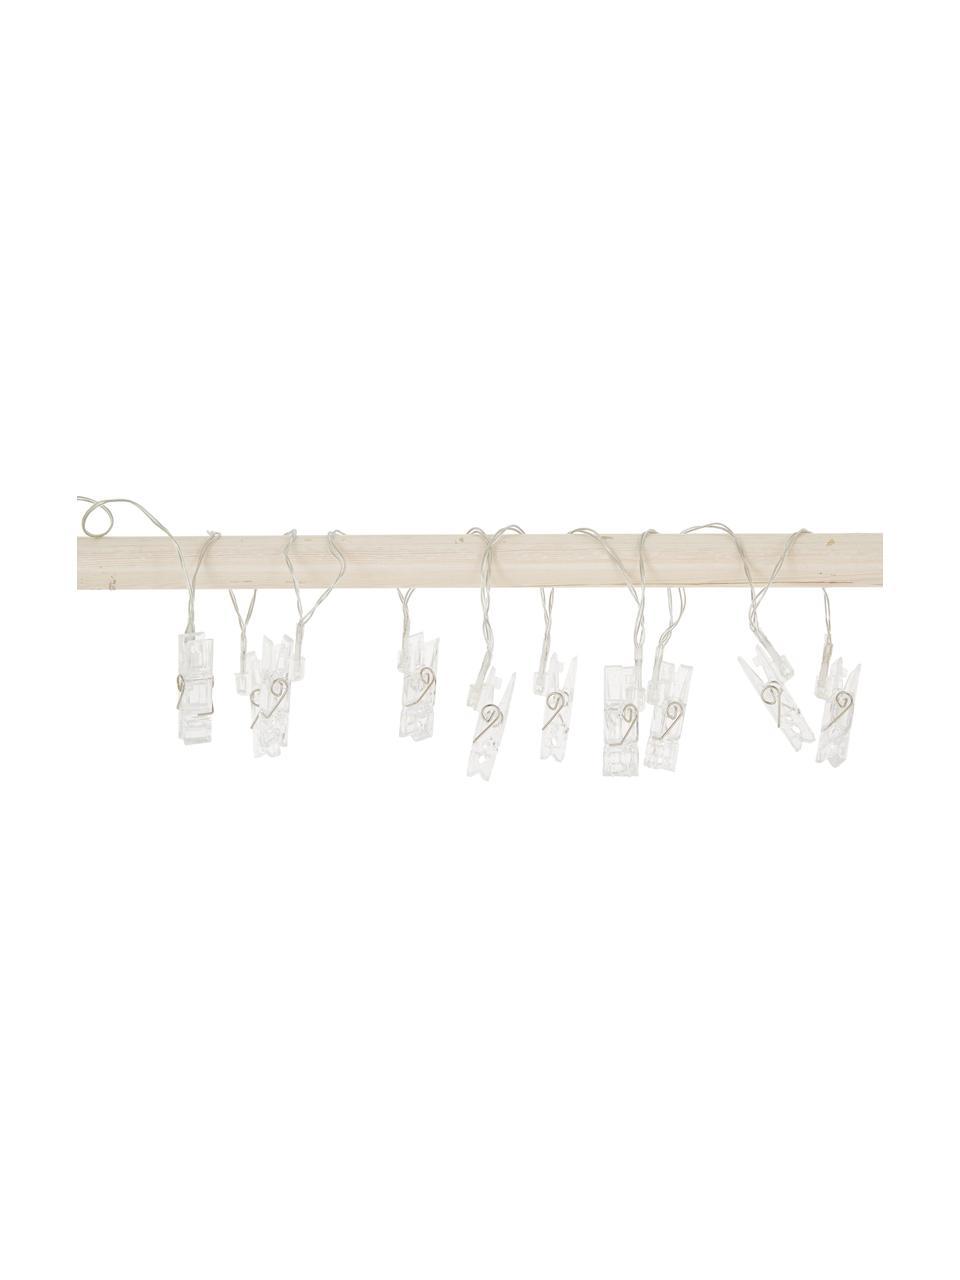 Ghirlanda a LED Clippy, 135 cm, 10 lampioni, Trasparente, Lung. 135 cm